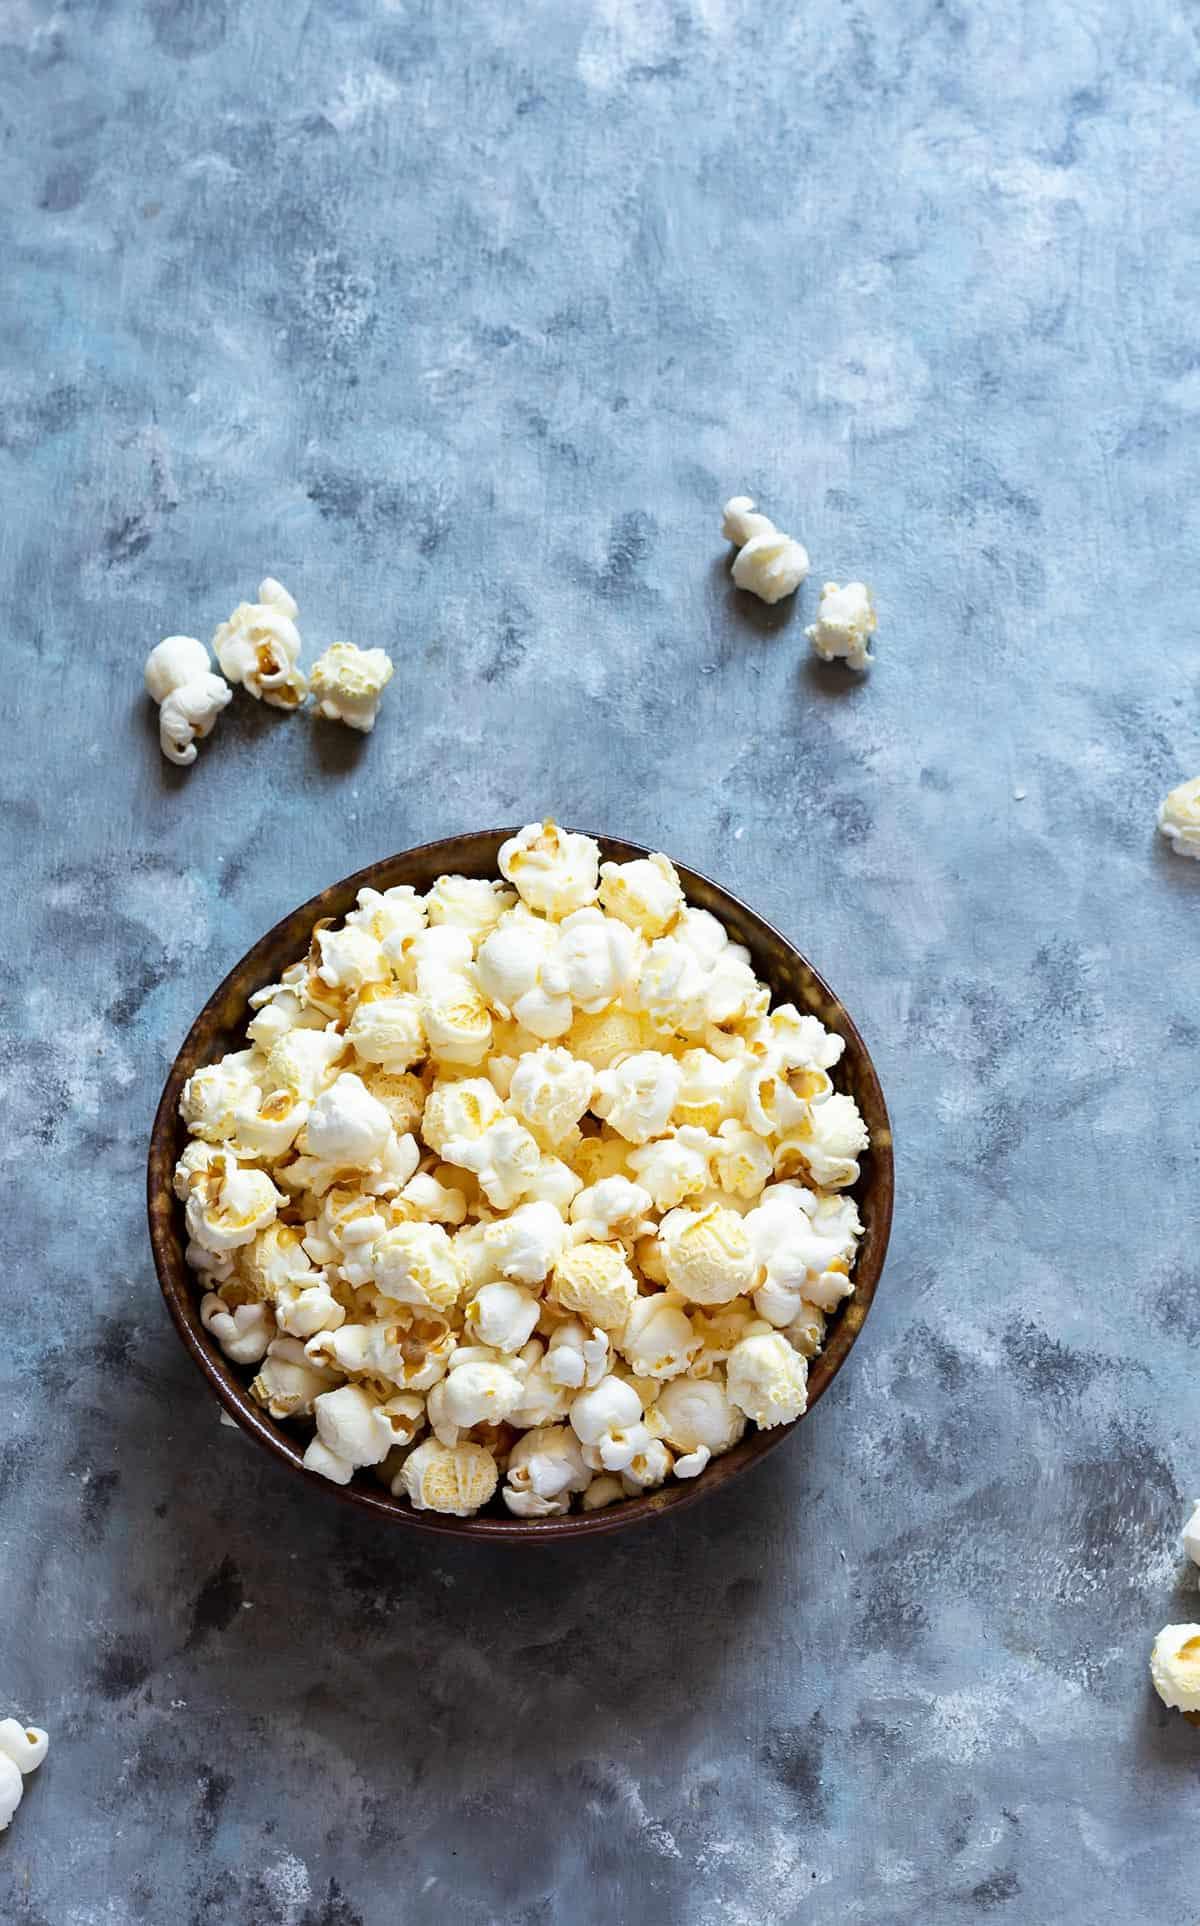 Bowl of Fresh Popcorn